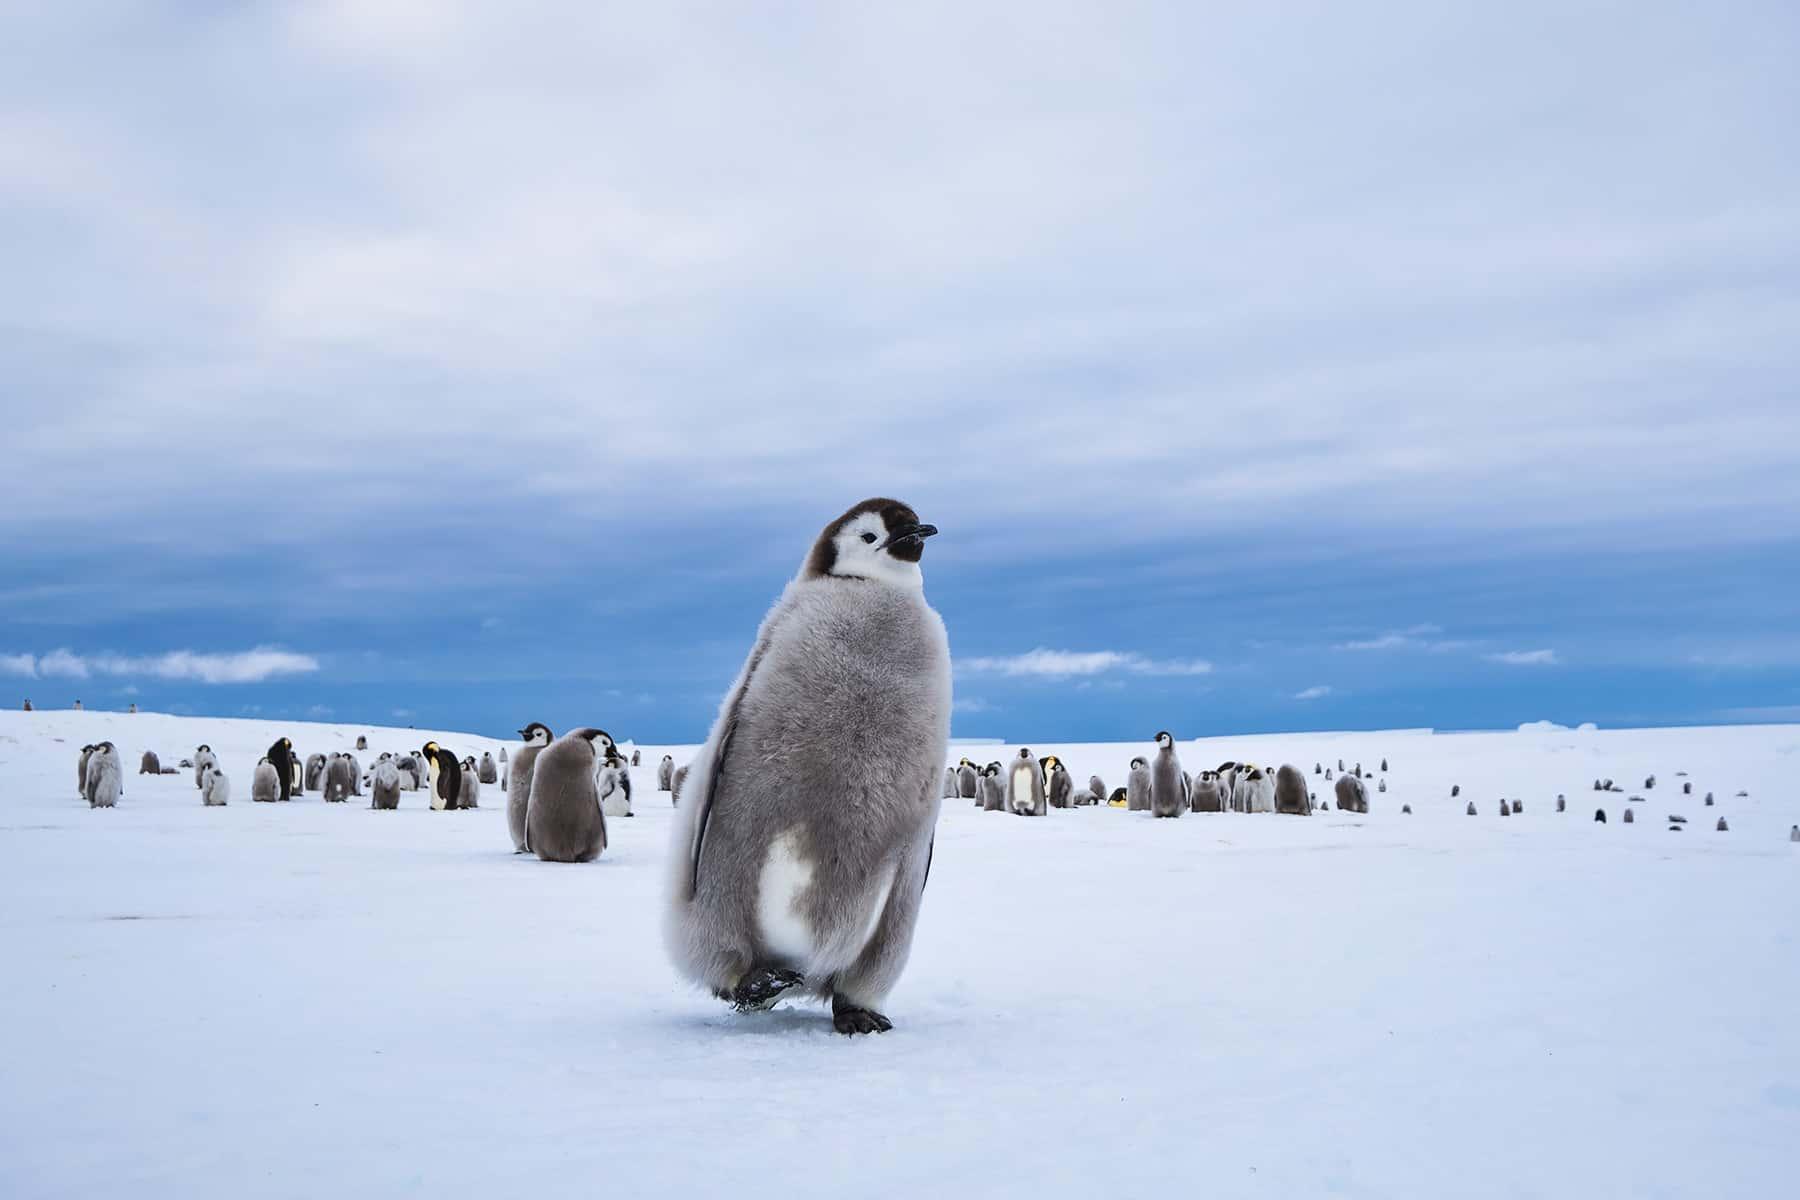 White Desert Pengwin Antarctica, фото